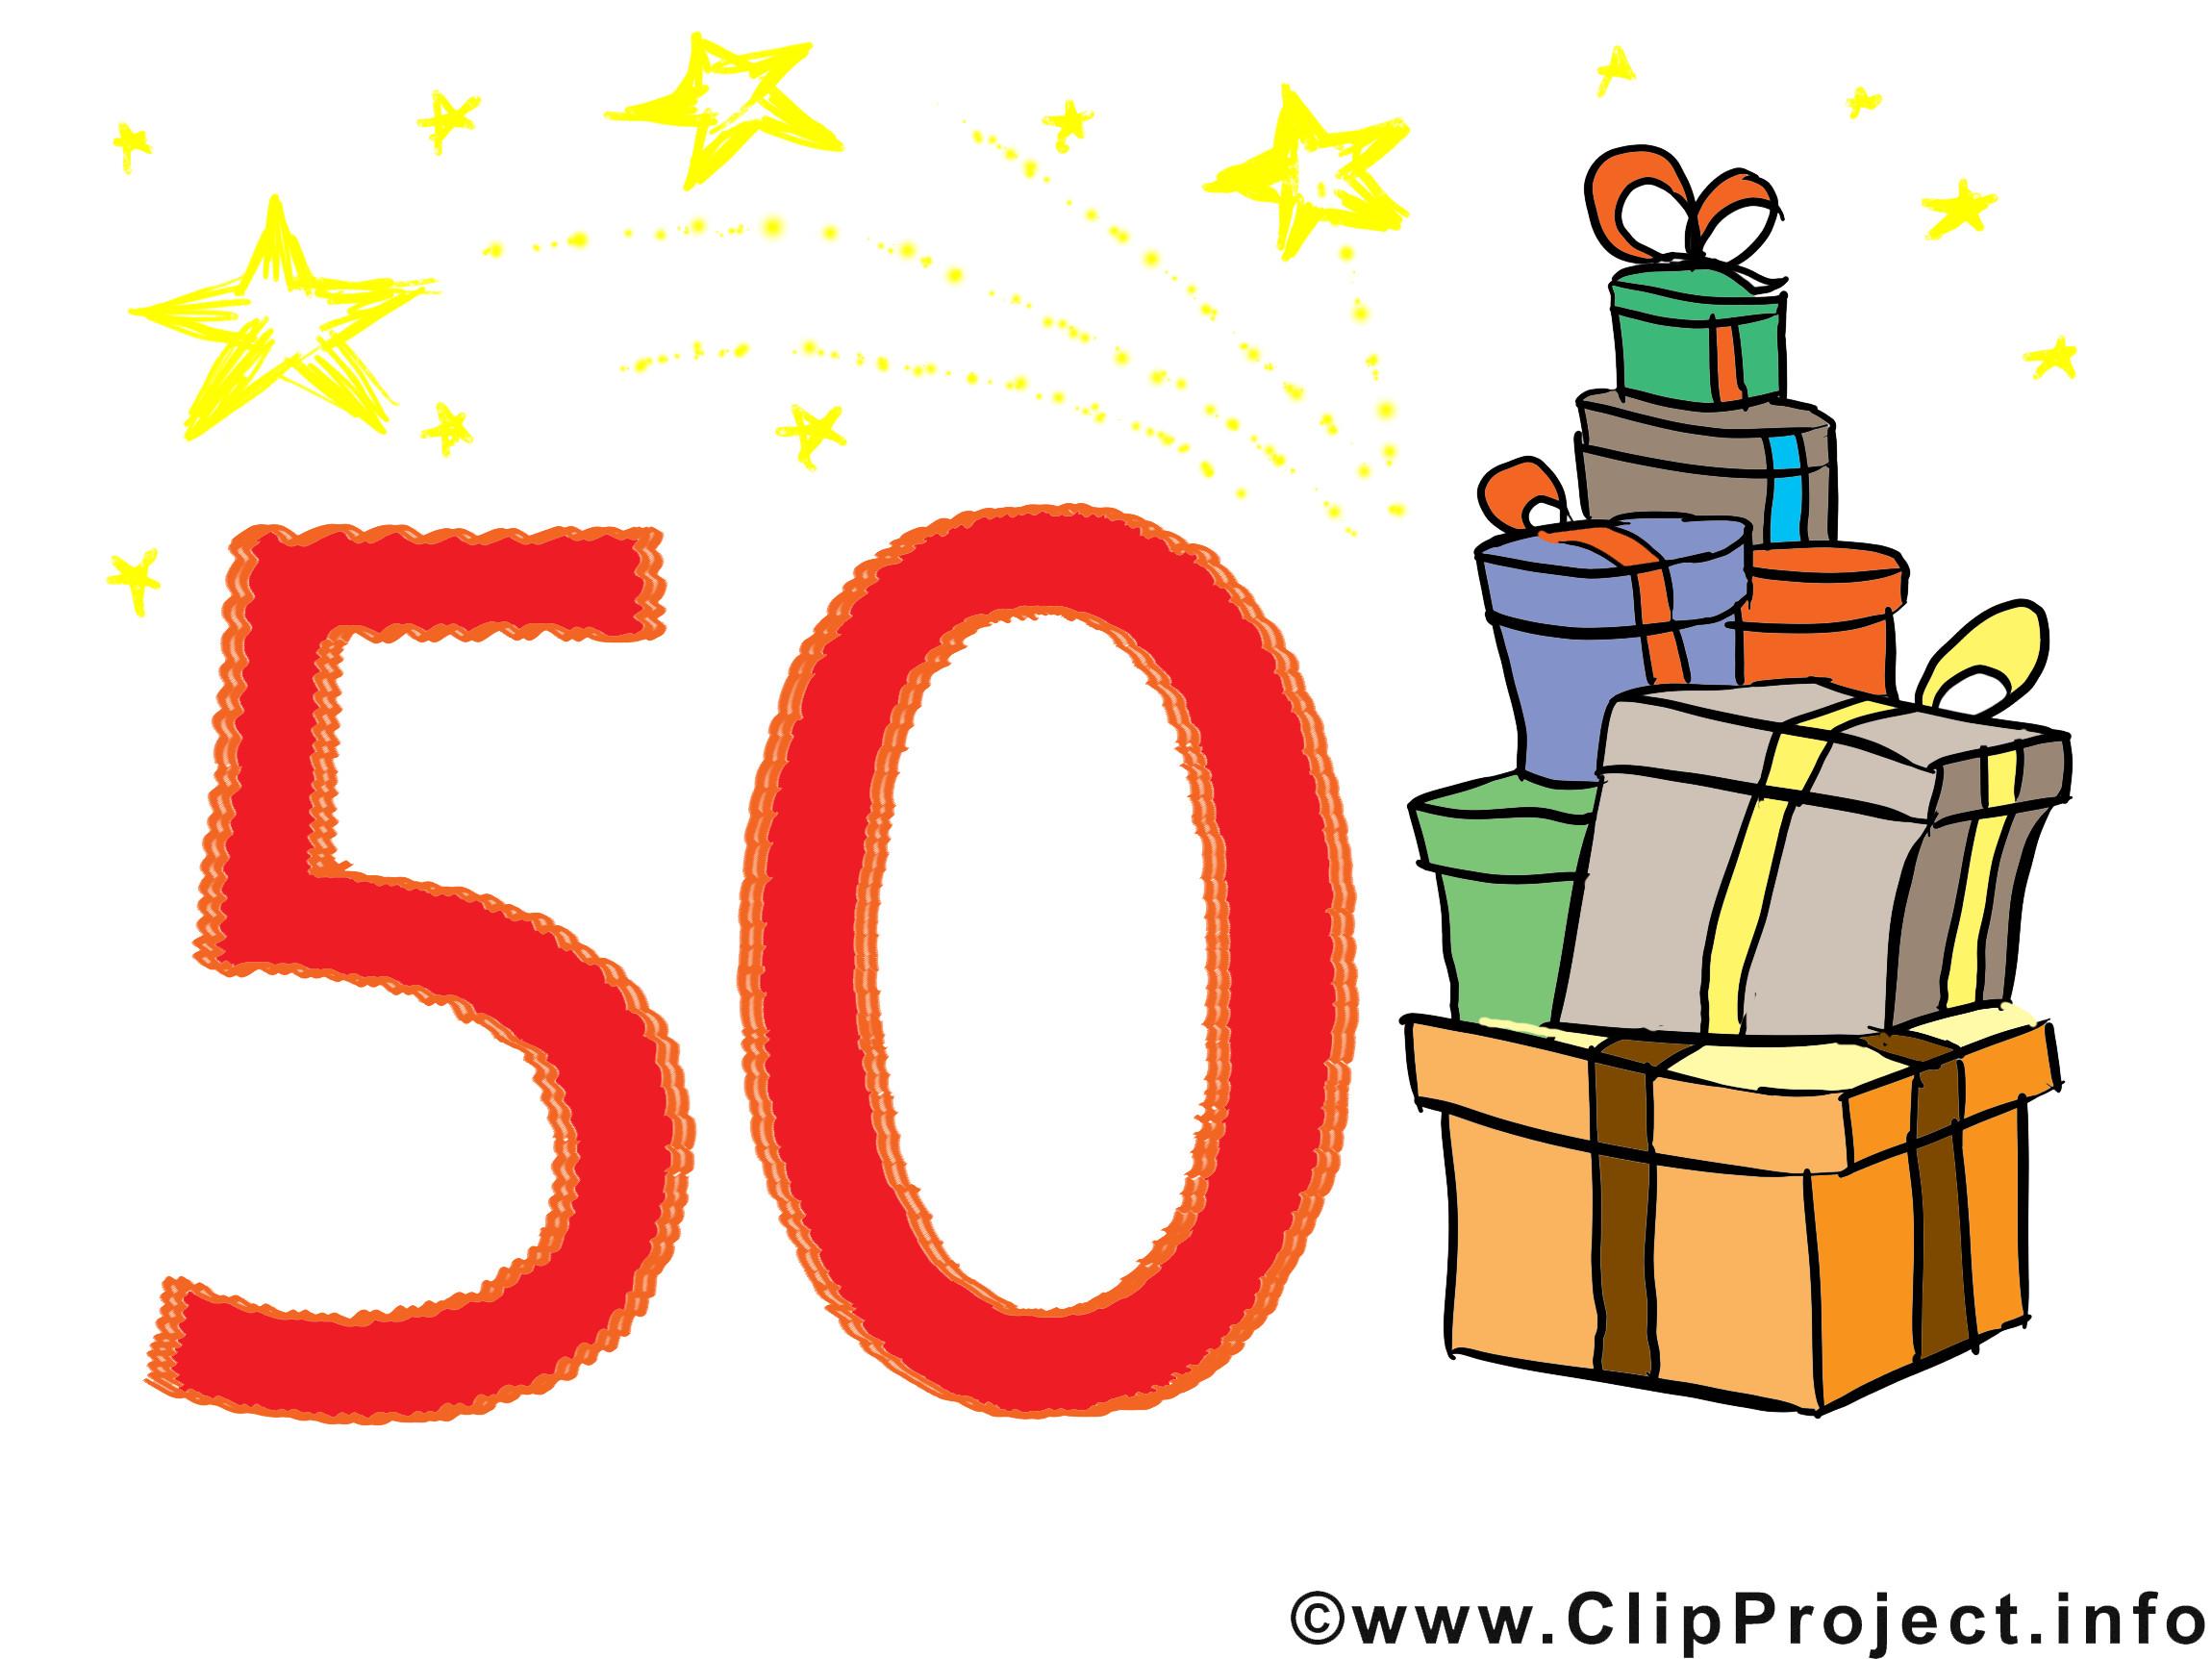 Geburtstagswünsche Zum 50  Geburtstagswünsche zum 50 Clipart Bild Glückwunschkarte